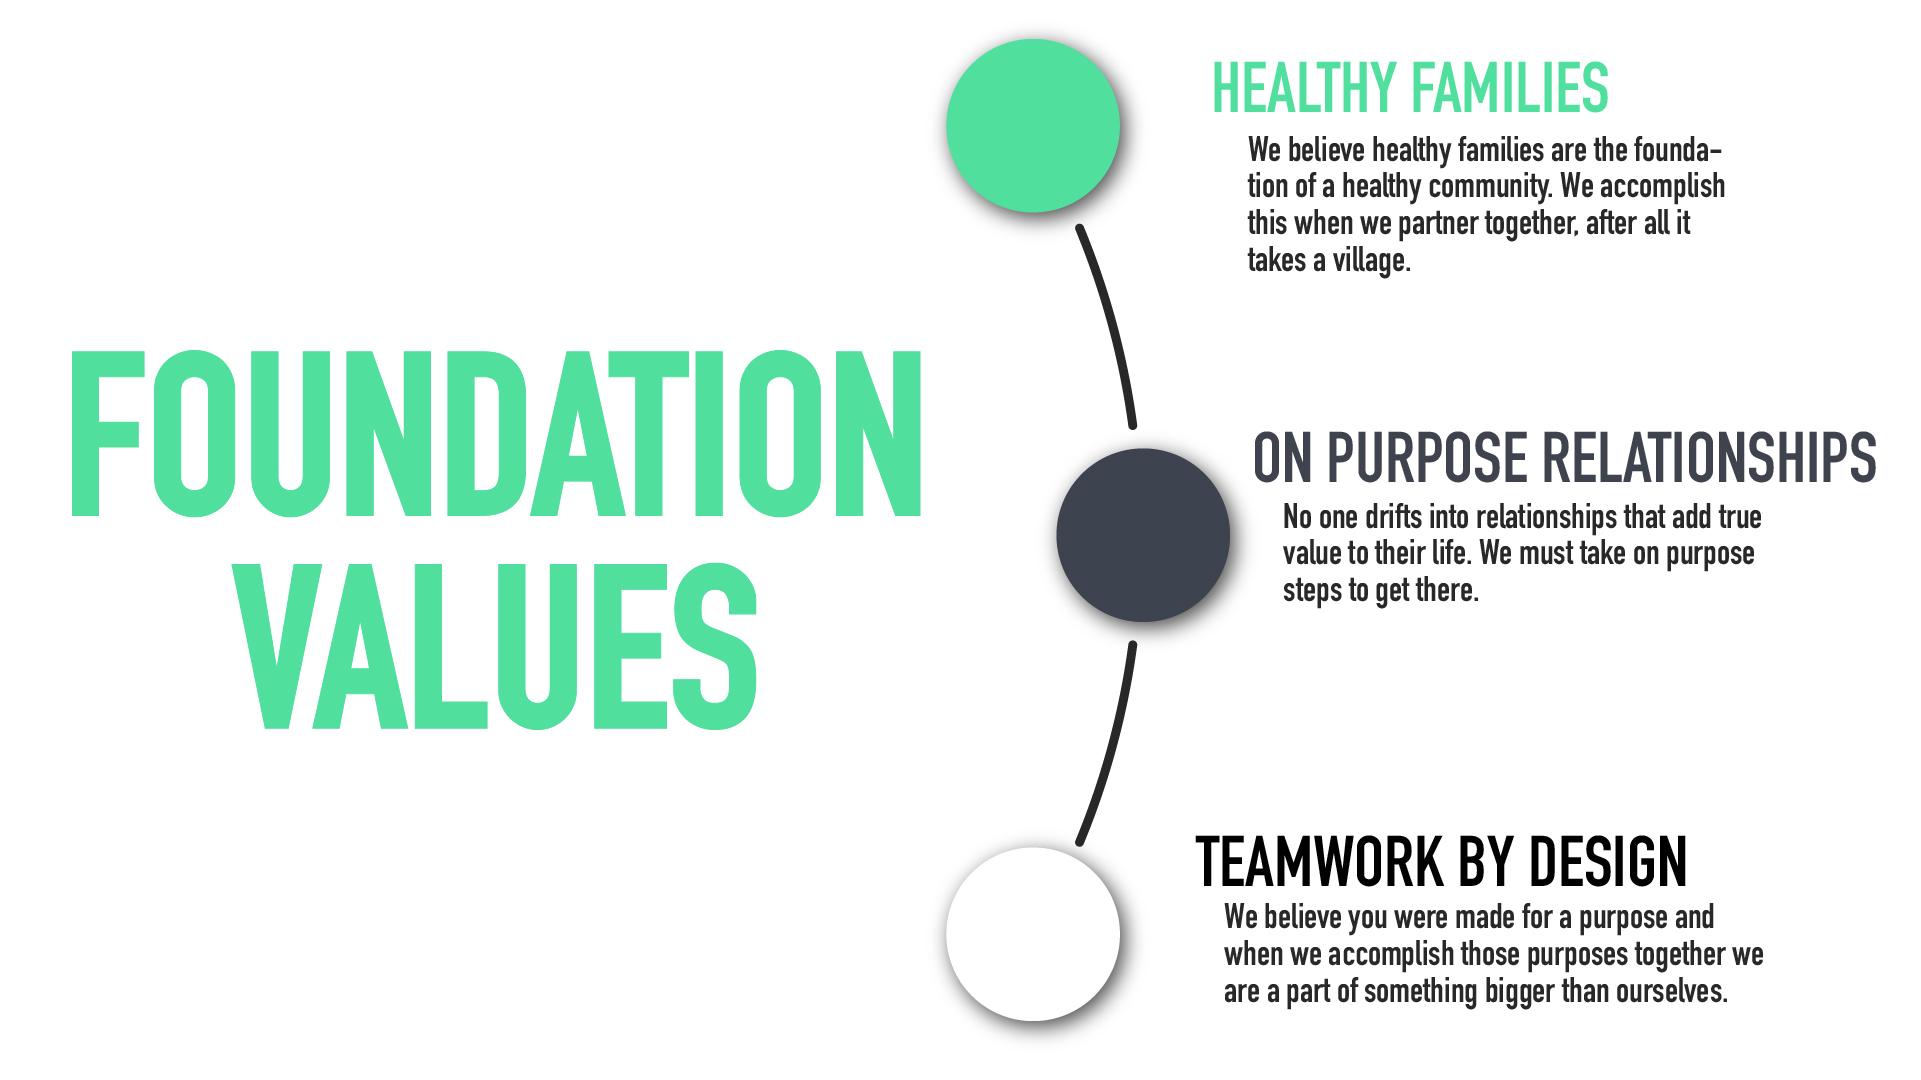 Foundation Values